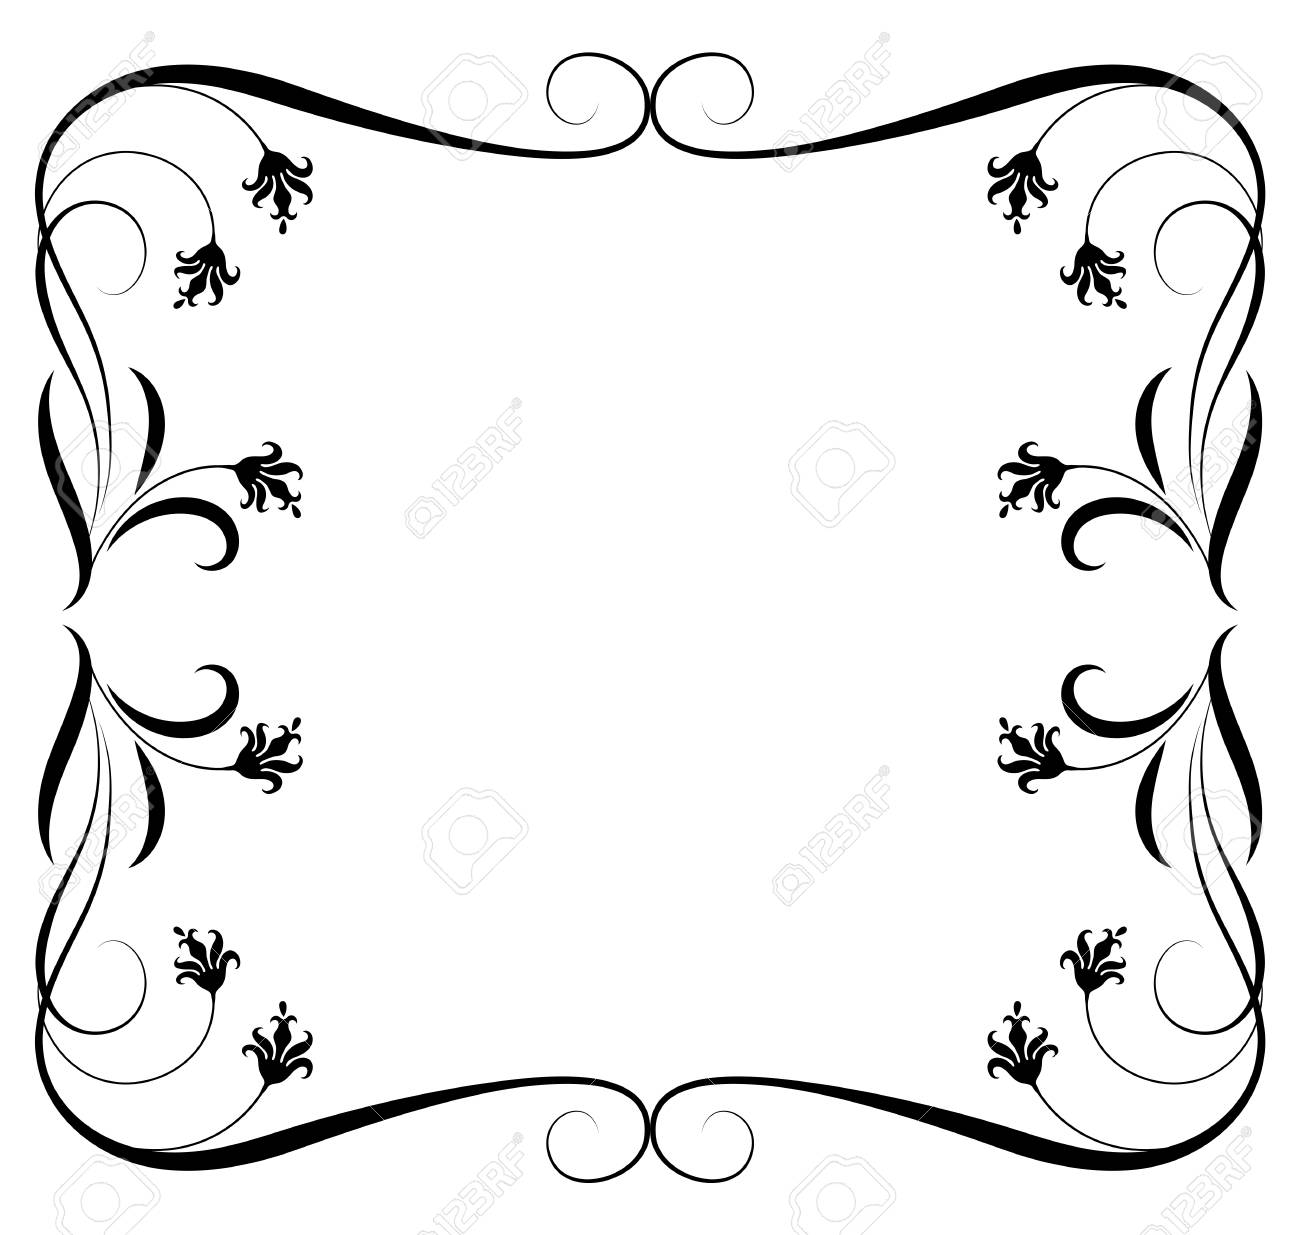 Decorative floral ornament frame for stencil isolated on white decorative floral ornament frame for stencil isolated on white background stock vector 79339036 jeuxipadfo Image collections